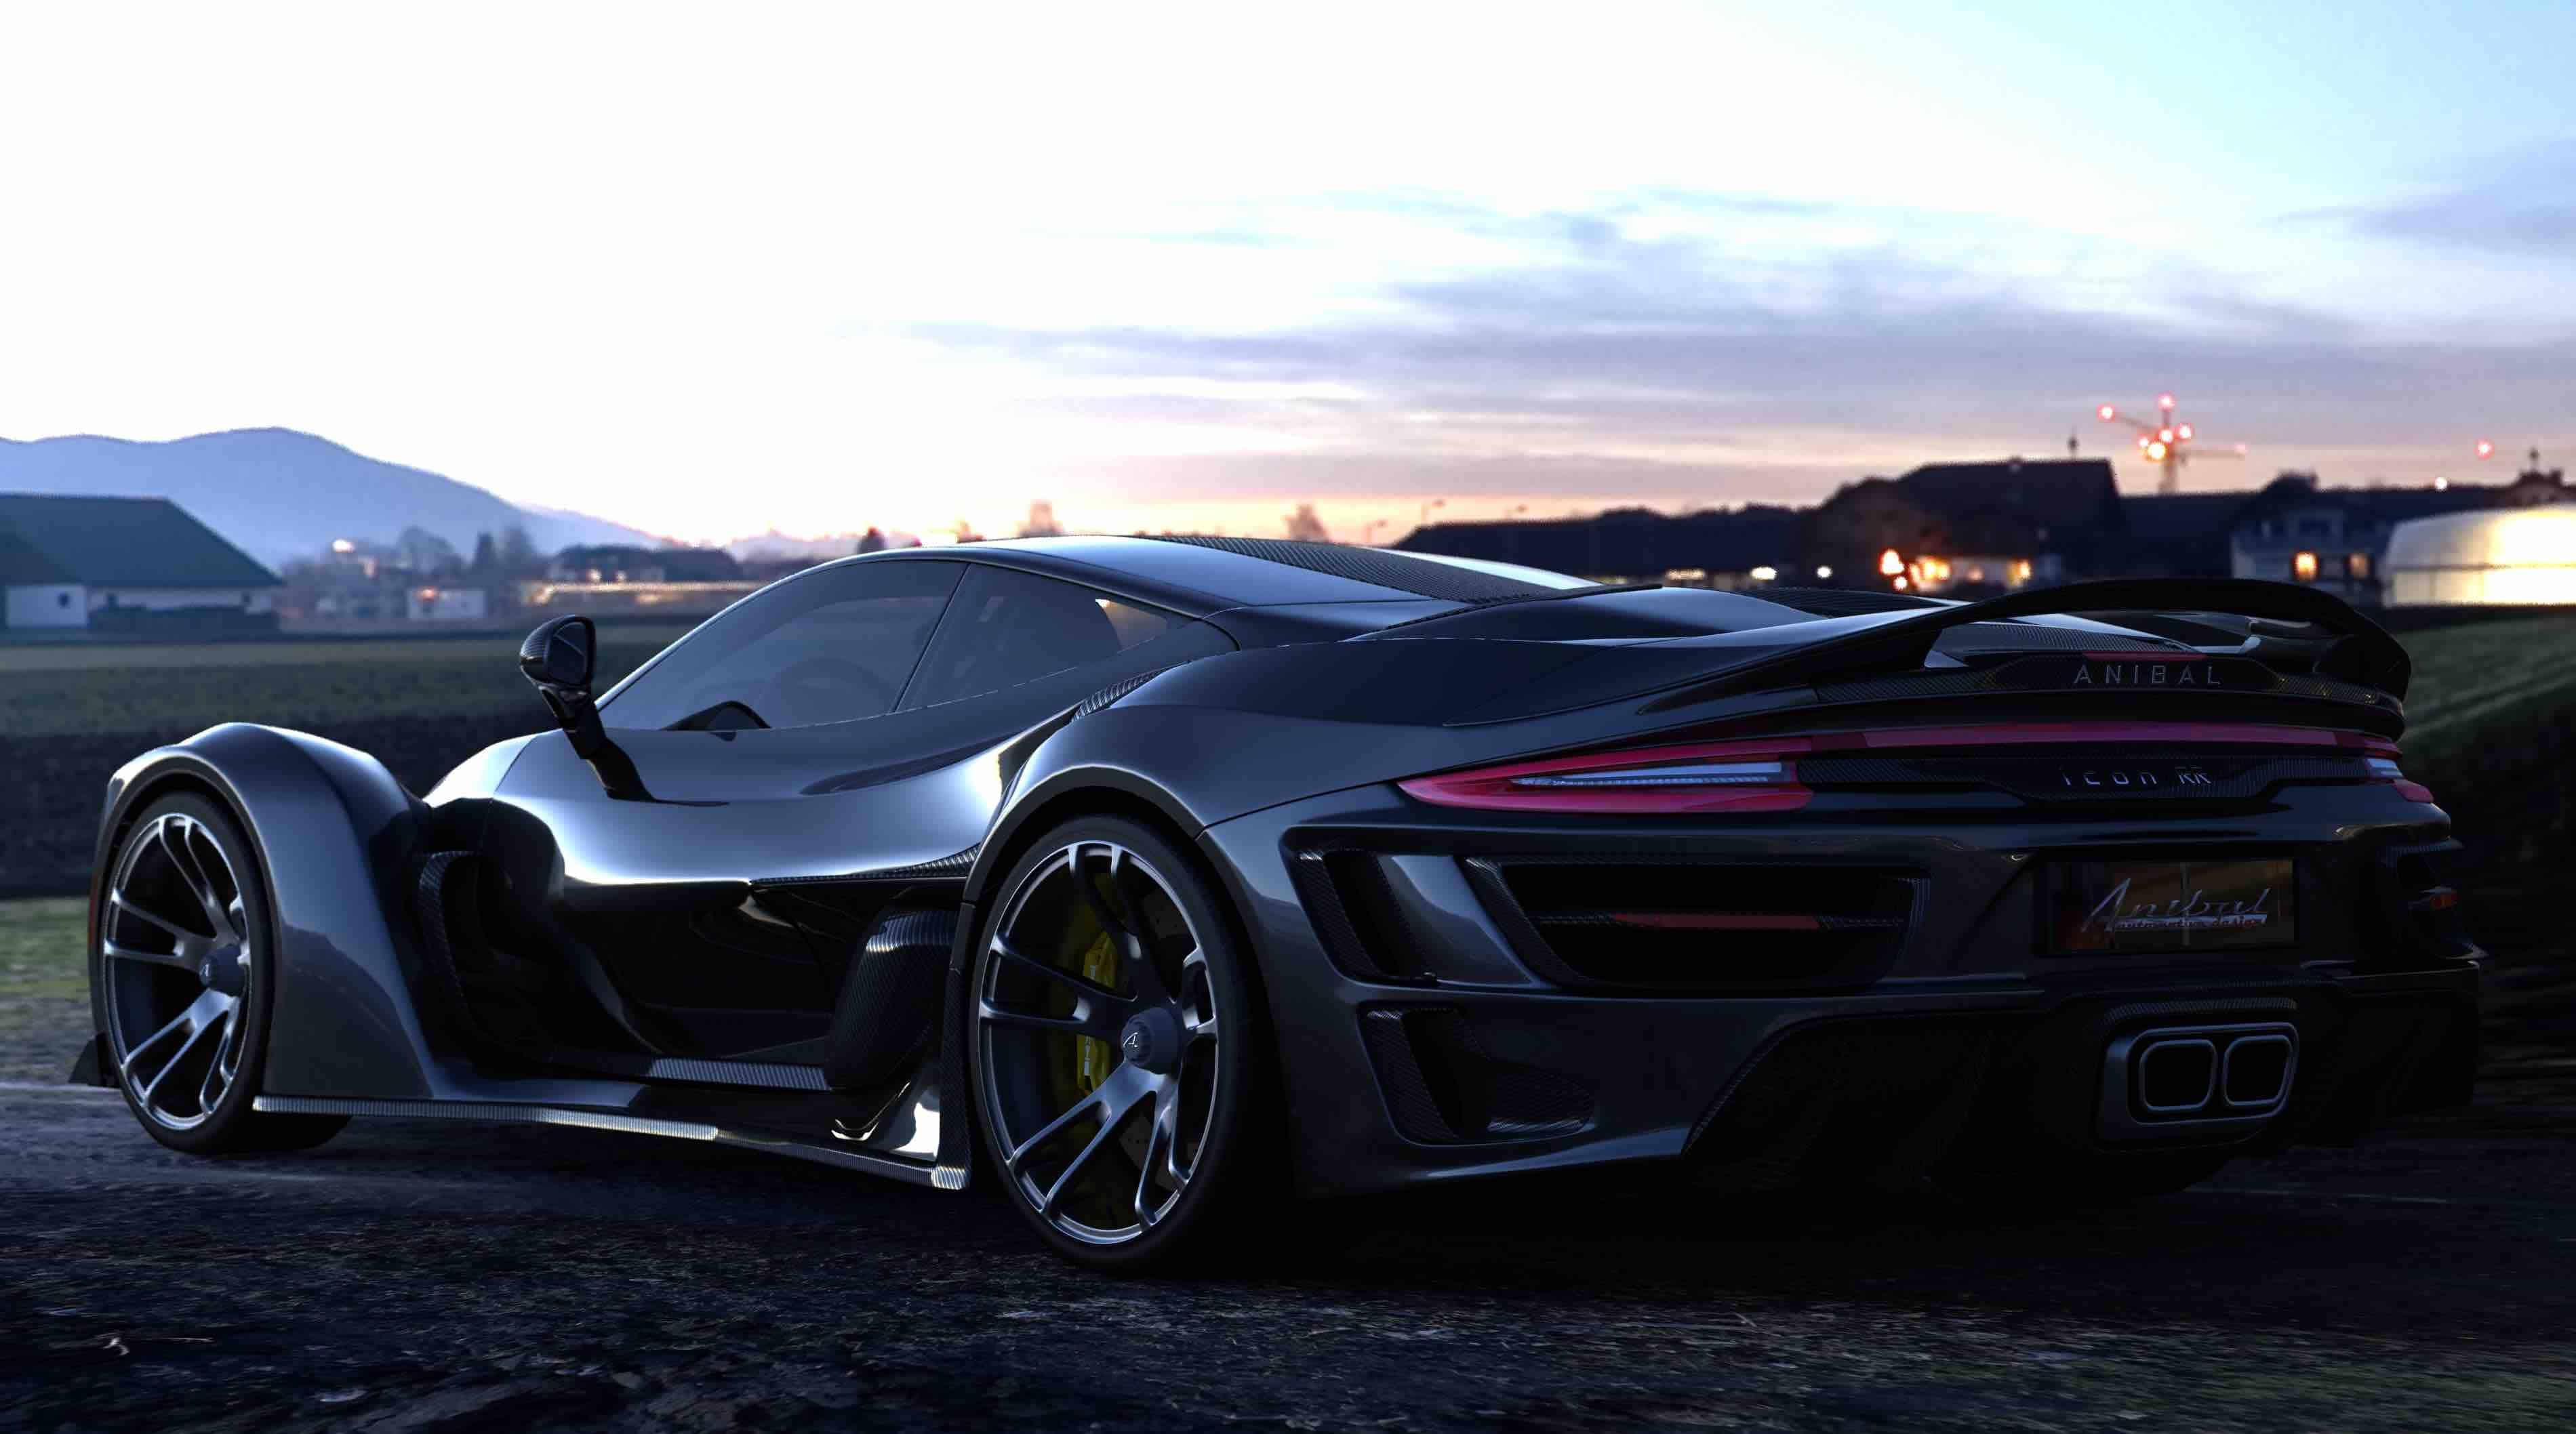 Súper coche canadiense propulsado por un motor Porsche de 920HP